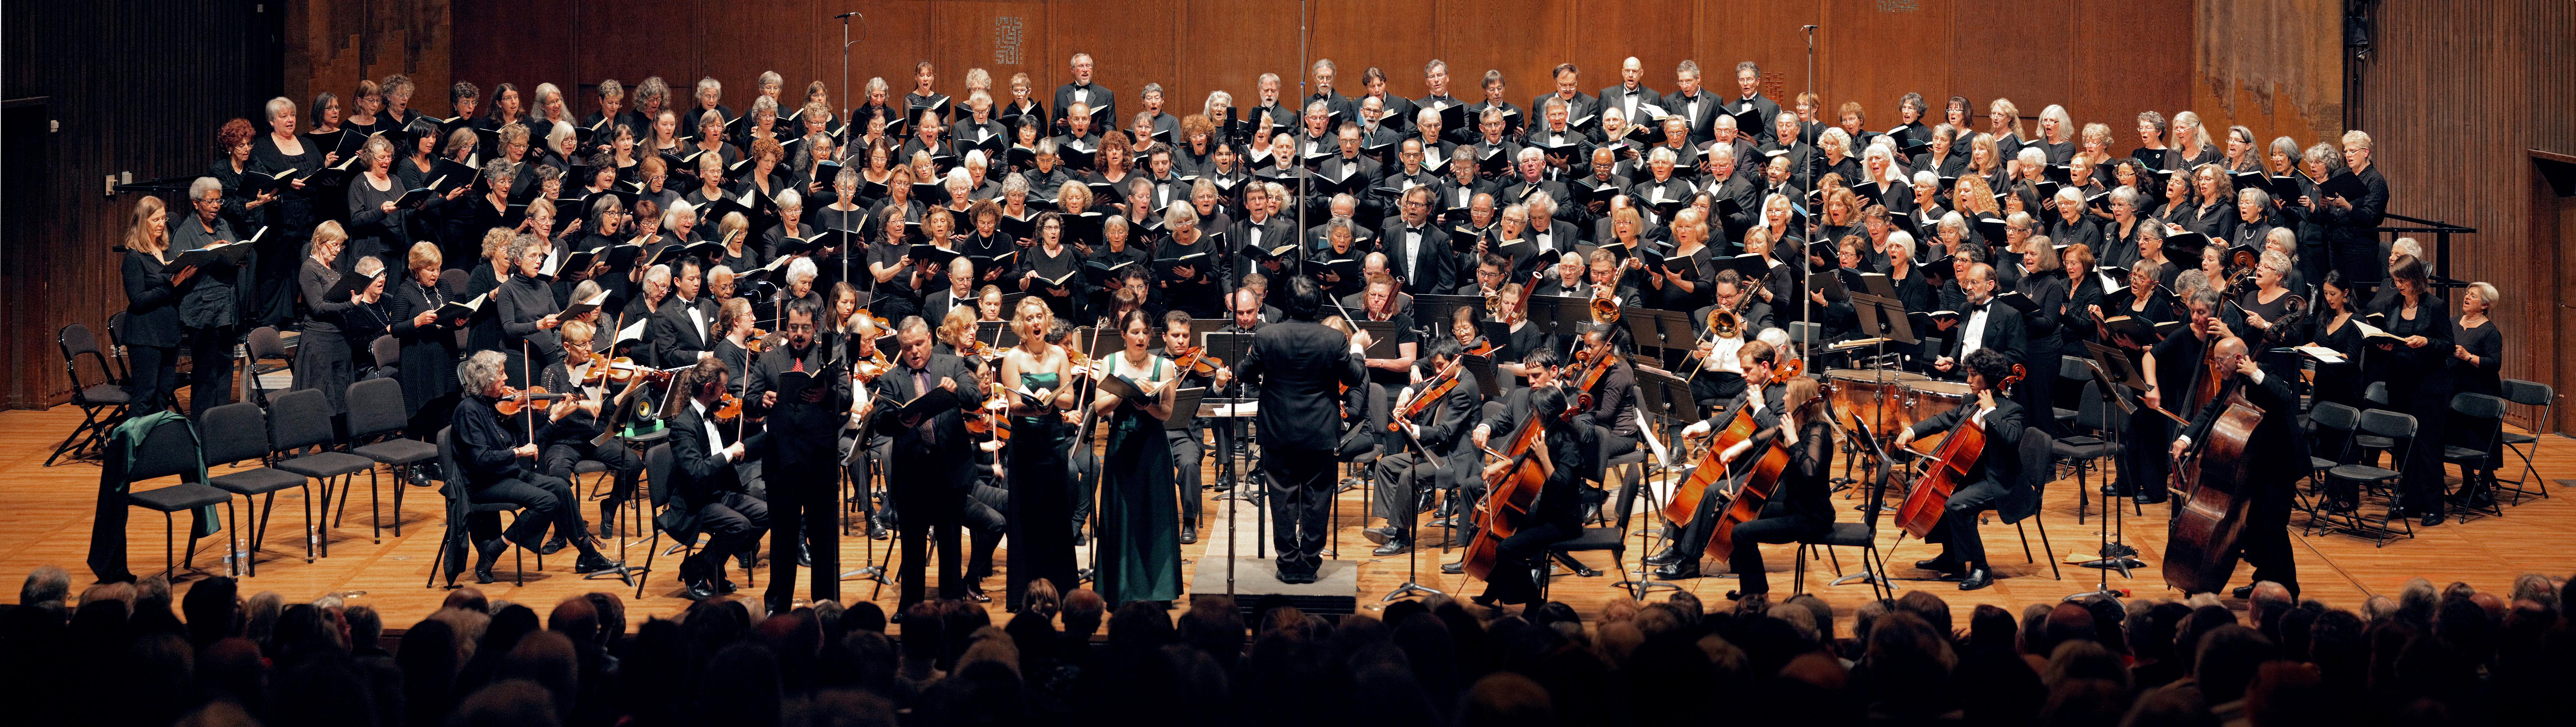 12-16-12C(web) Mozart, Great Mass in C Minor,  Hertz Hall, UC Berkeley,   Fall, 2012